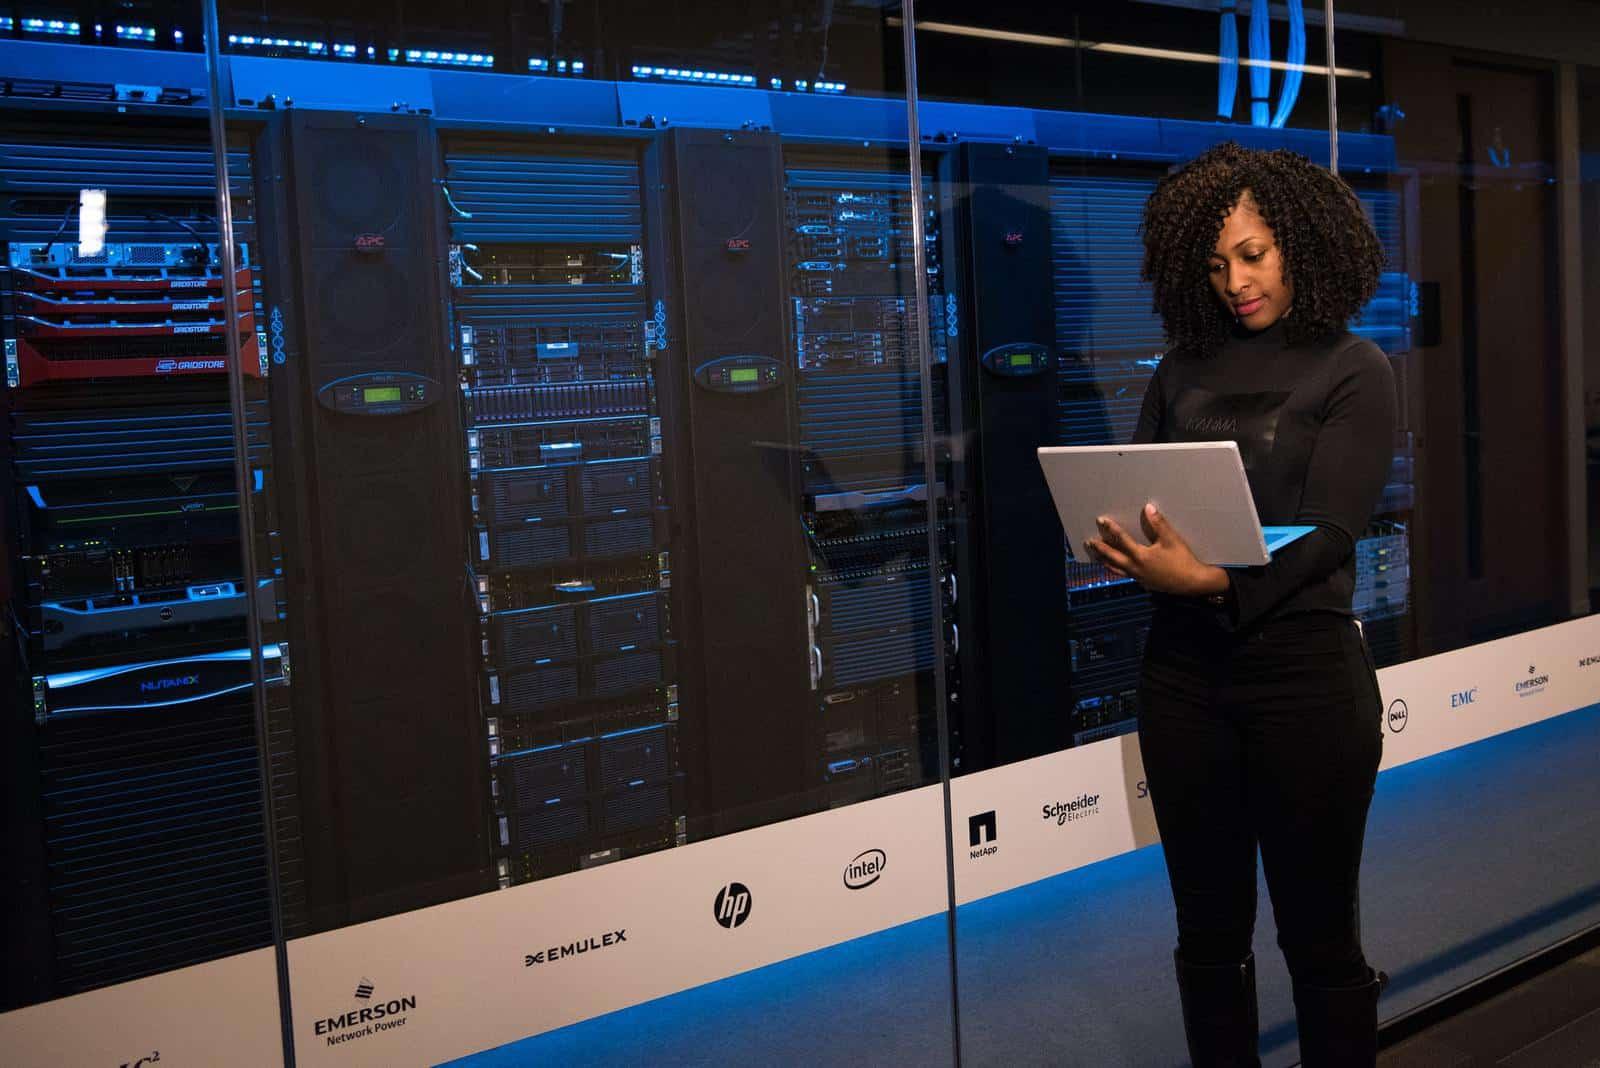 Woman using laptop next to server